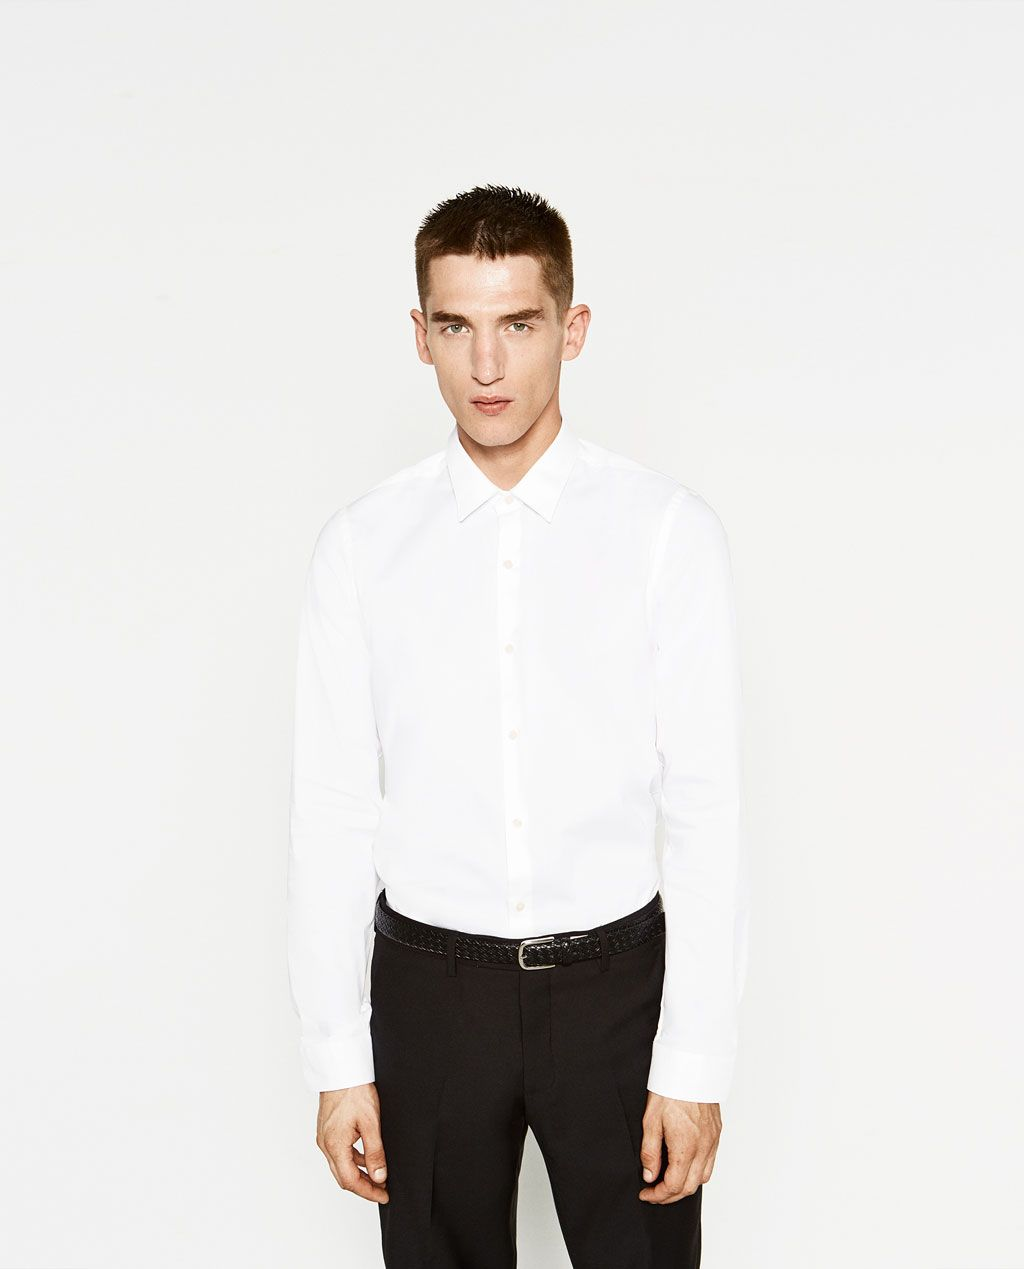 Image 2 Of Plain Shirt From Zara Men Trade Show Outfits